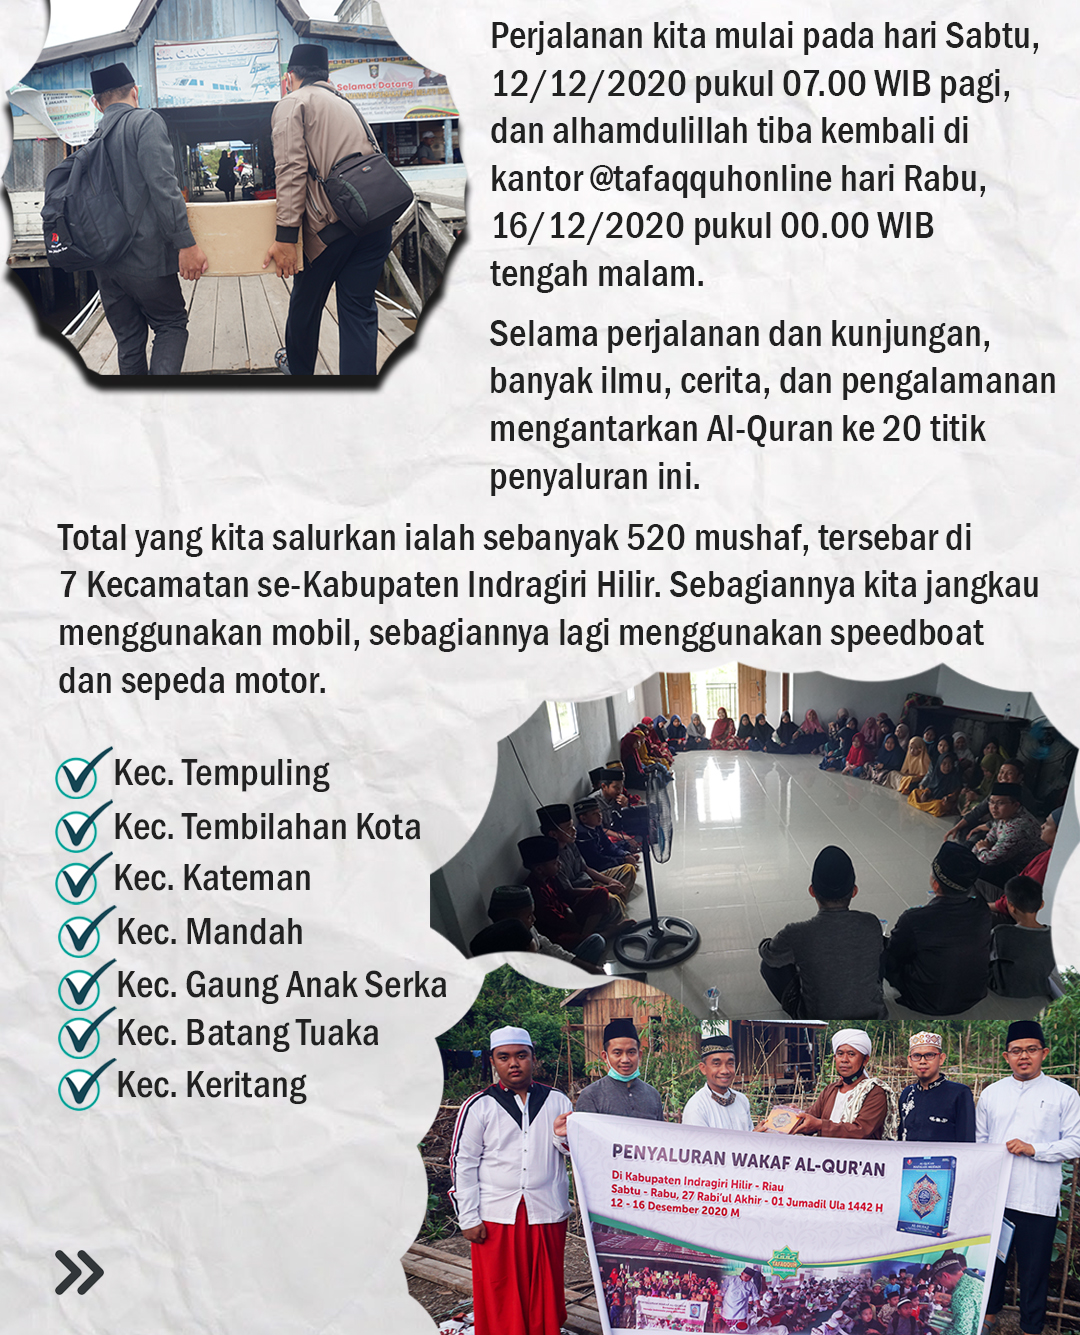 Menyambung Cinta Dengan Al-Quran (Laporan Penyaluran Wakaf Al-Quran ke Kab. Indragiri Hilir, Riau)